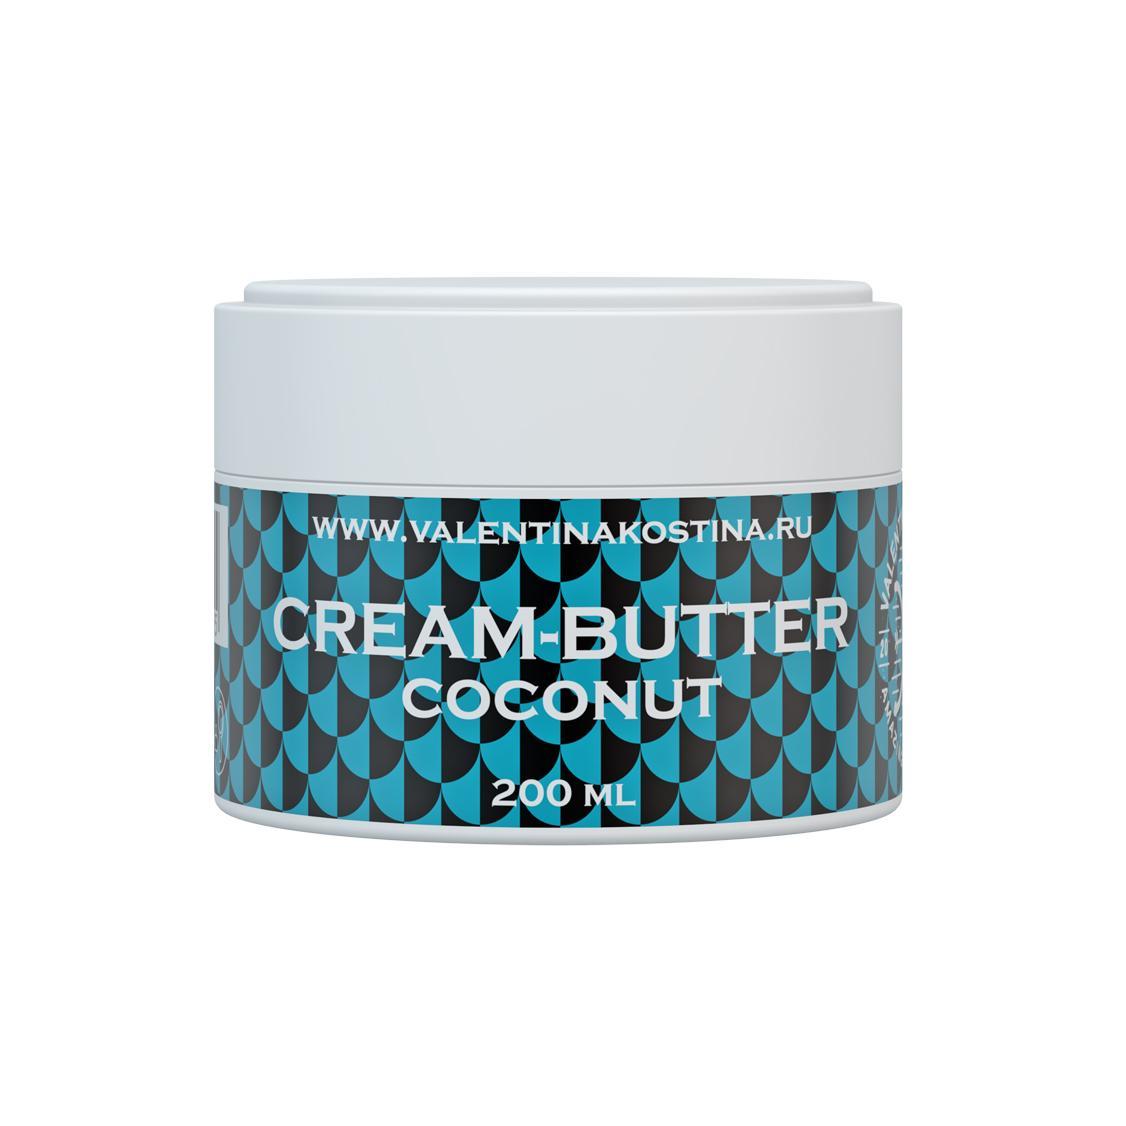 Крем-баттер Valentina Kostina Cream-butter Coconut Для тела